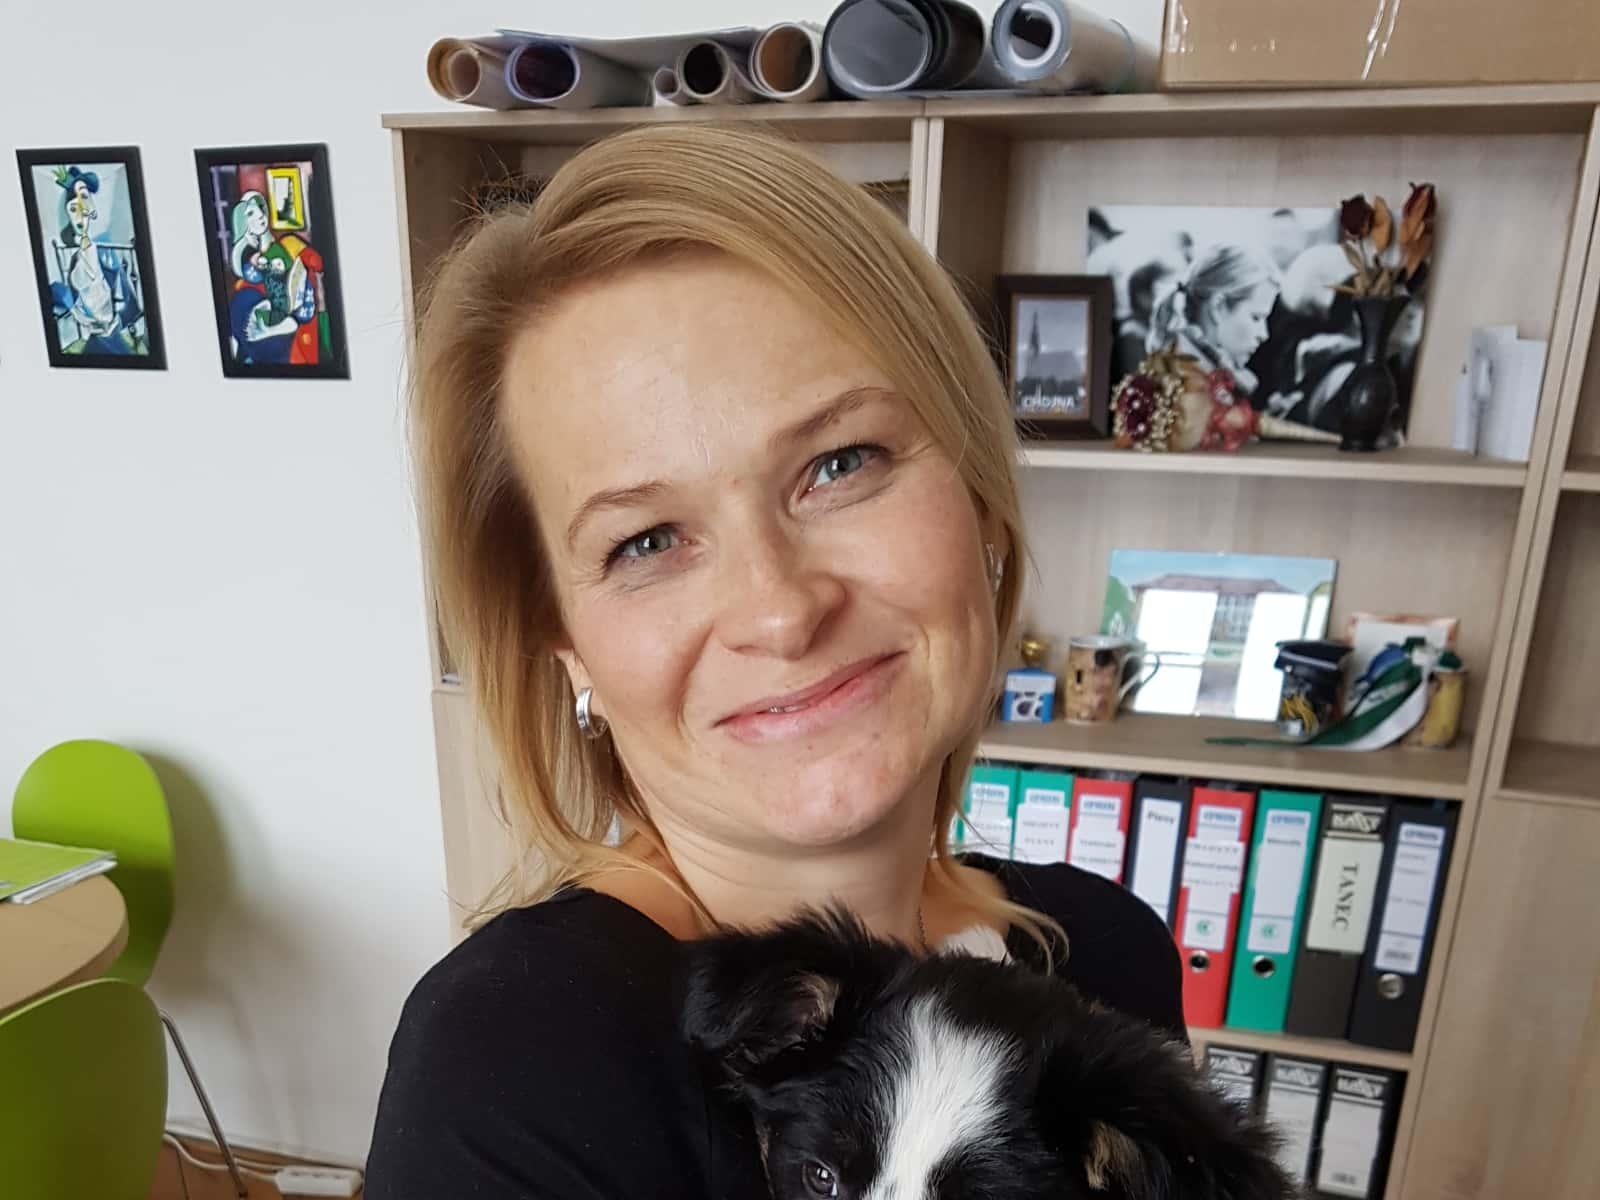 Olga from Sušice, Czech Republic